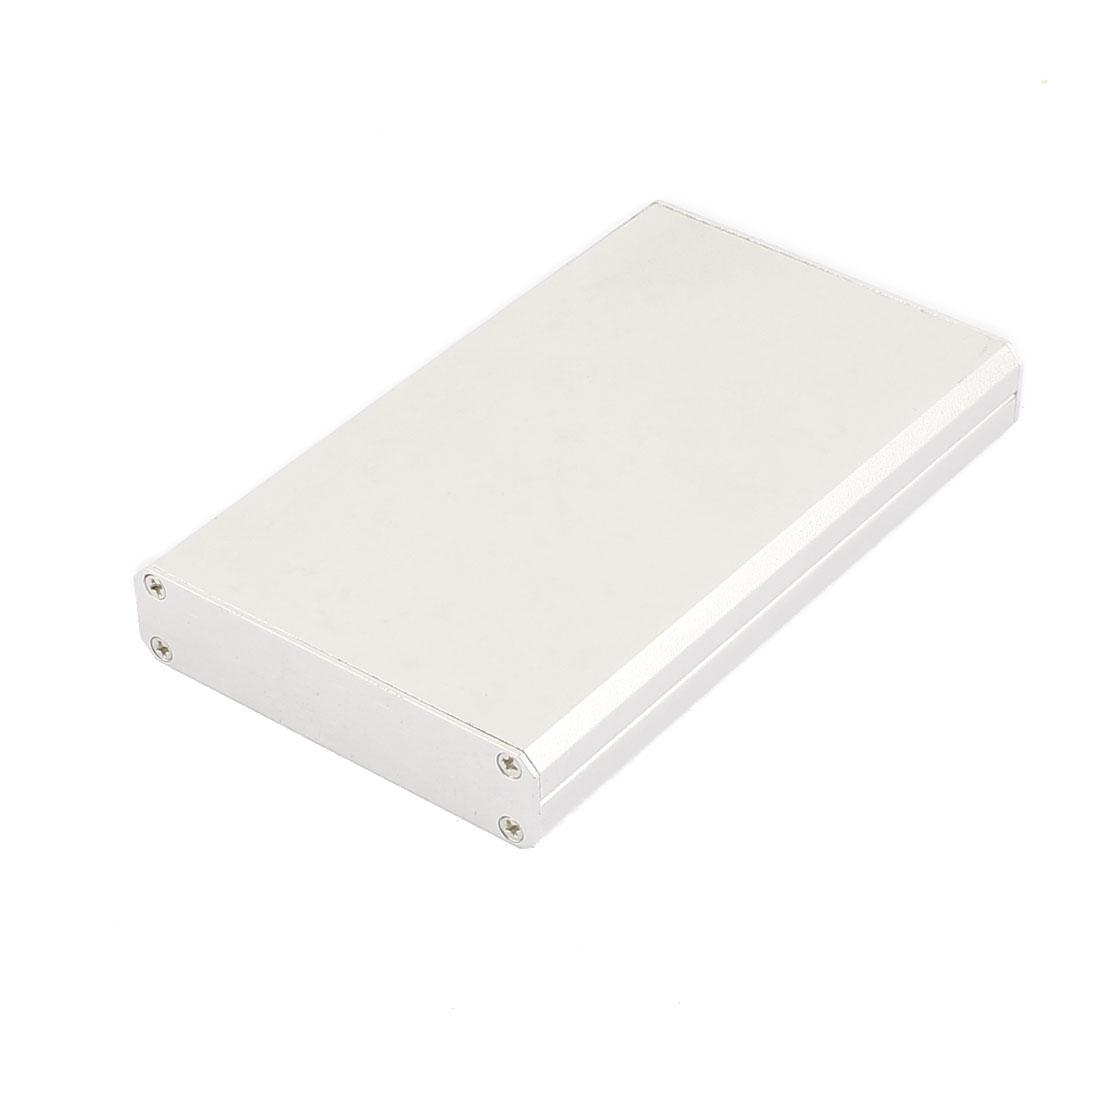 113 x 67 x 15mm Multi-purpose Electronic Extruded Aluminum Enclosure Silver Tone